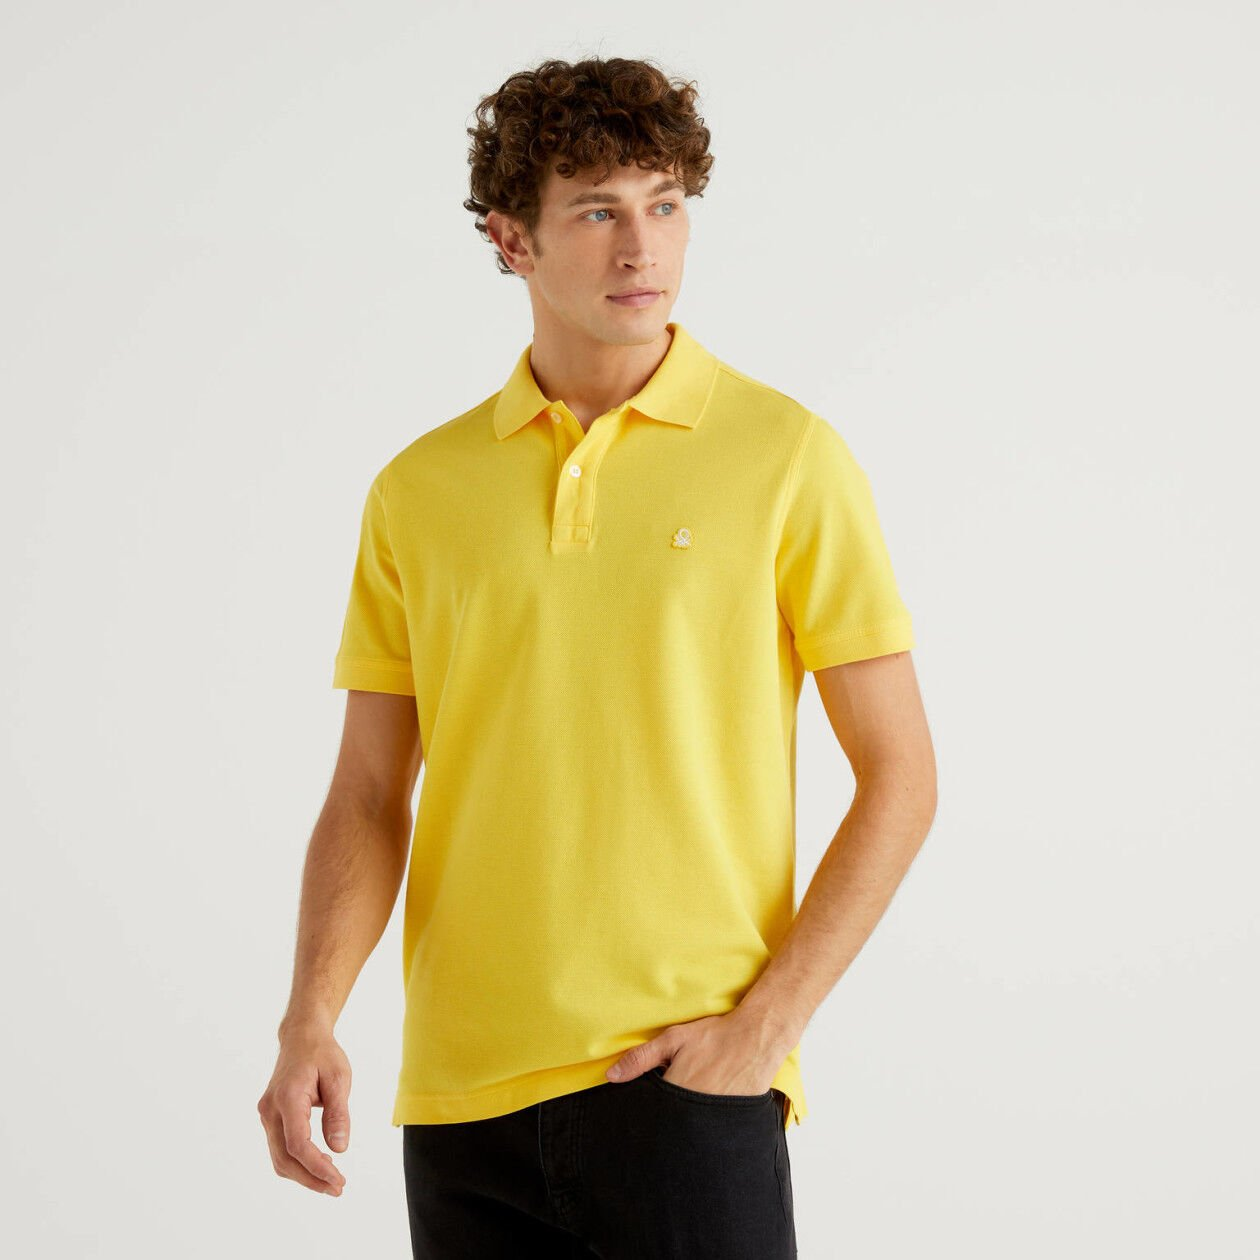 Polo regular fit κίτρινο